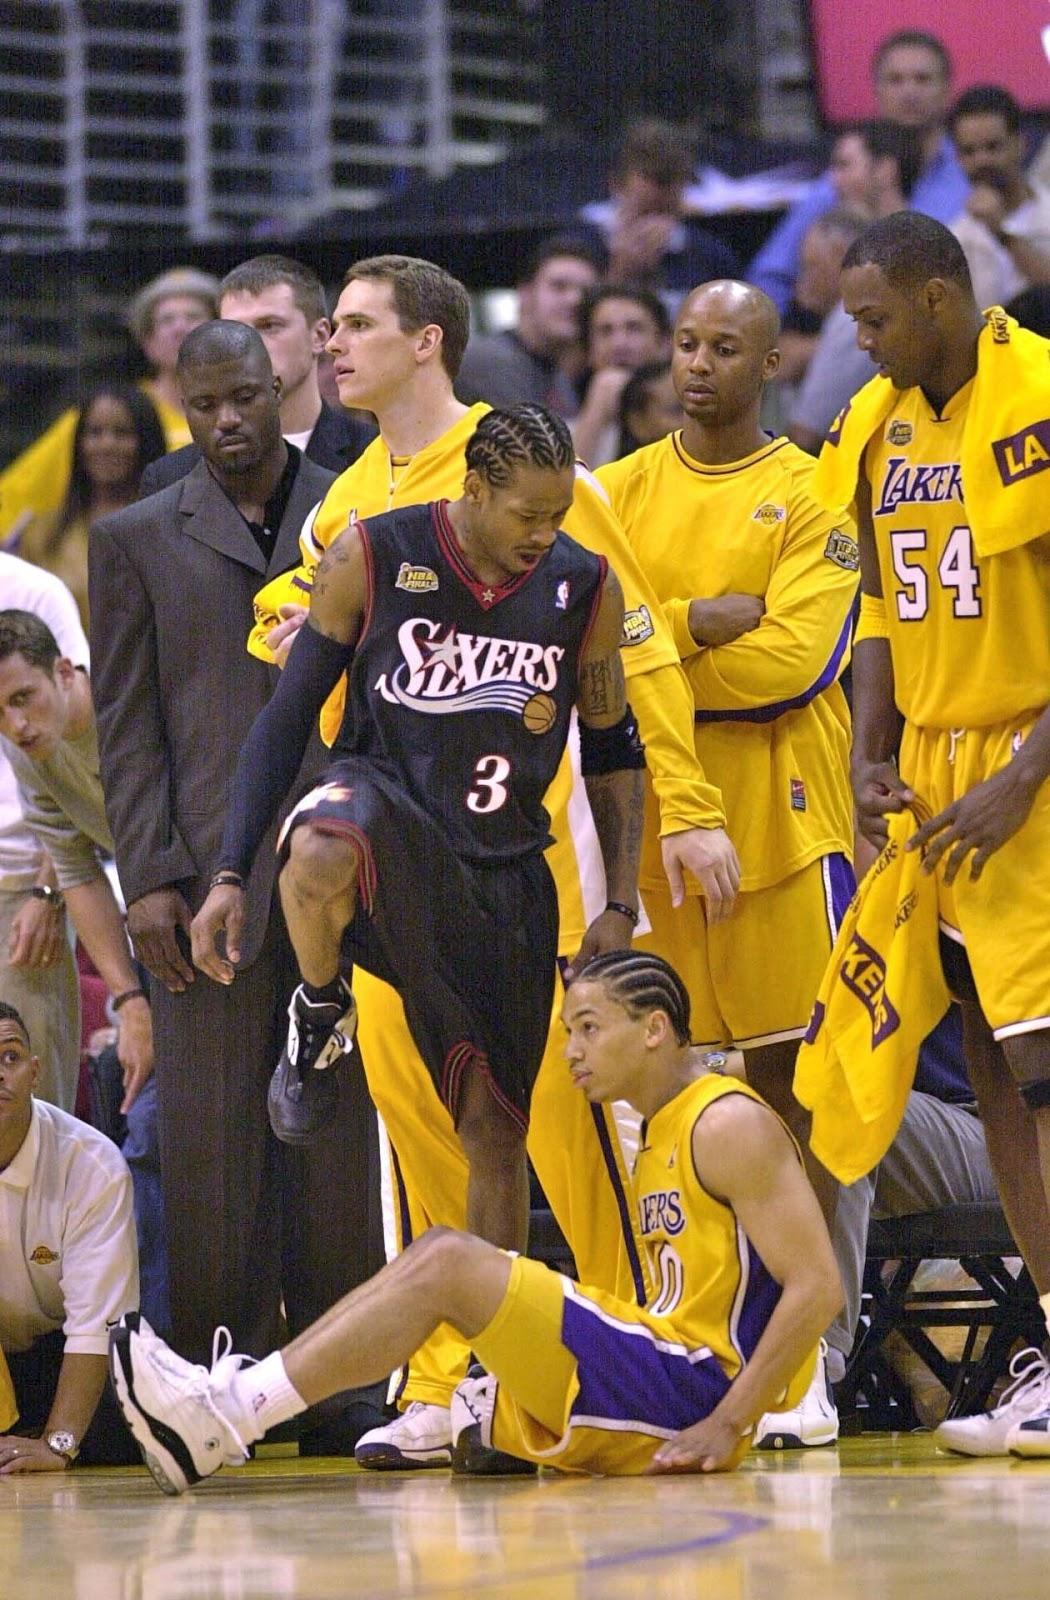 allen iverson tyronn lue - 15 years ago Allen Iverson took Tyronn Lue